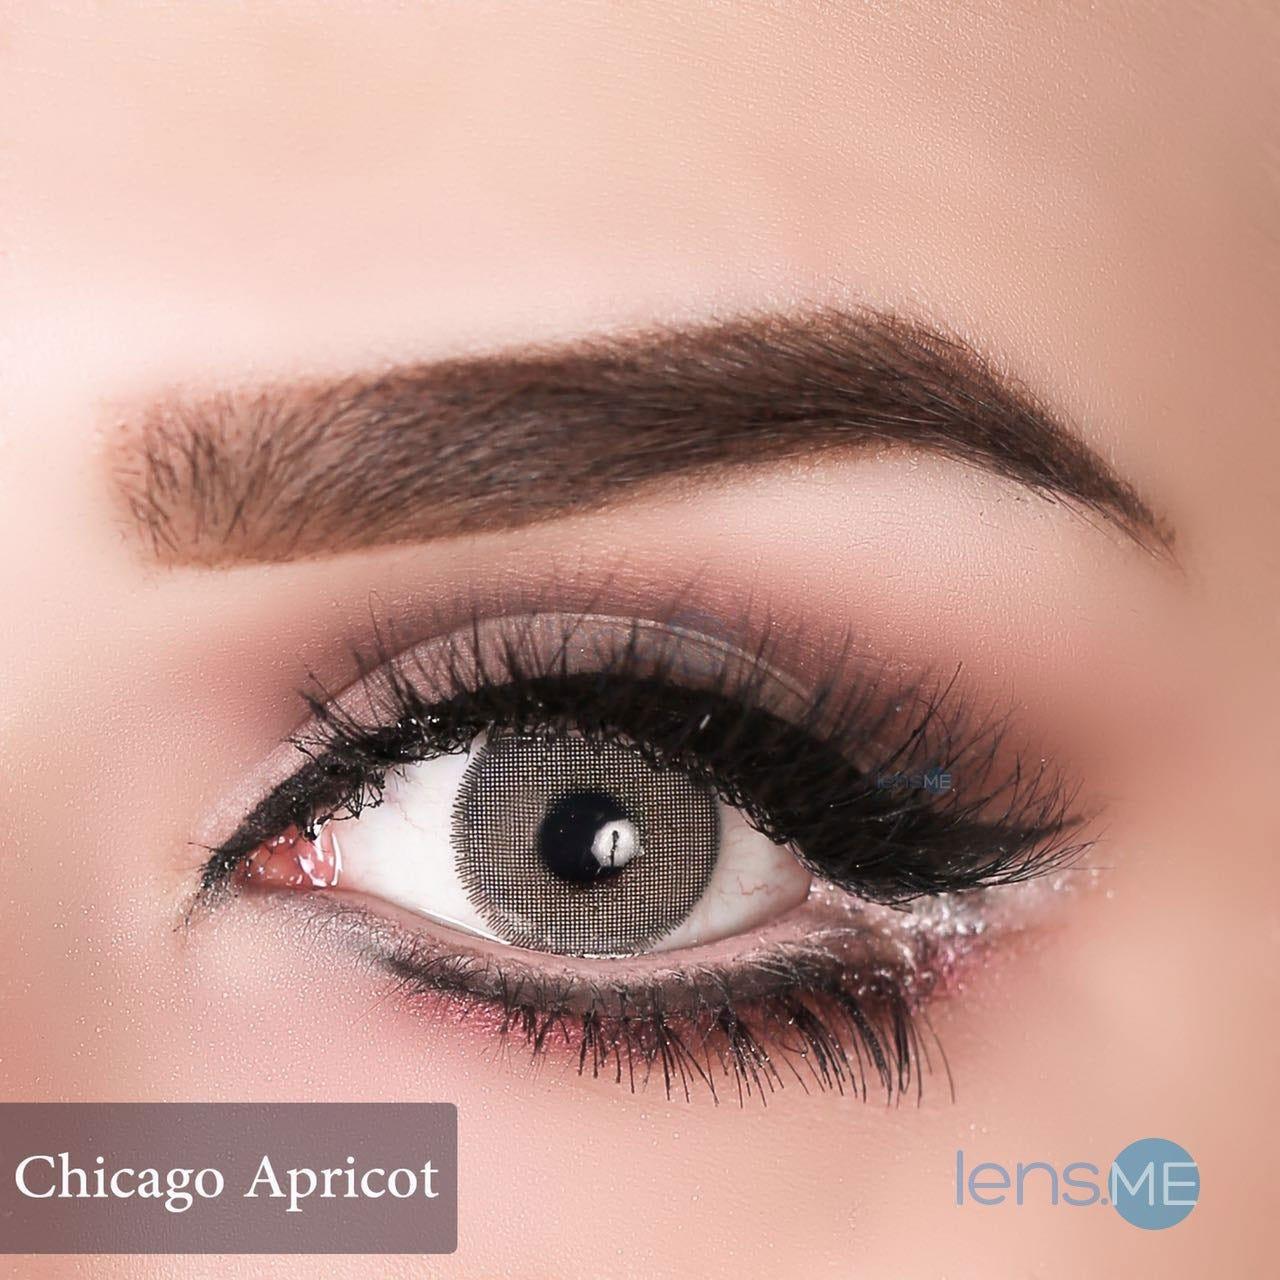 Anesthesia lenses dream anesthetic addict usa anesthesia usa chicago apricot 2 lenses nvjuhfo Image collections